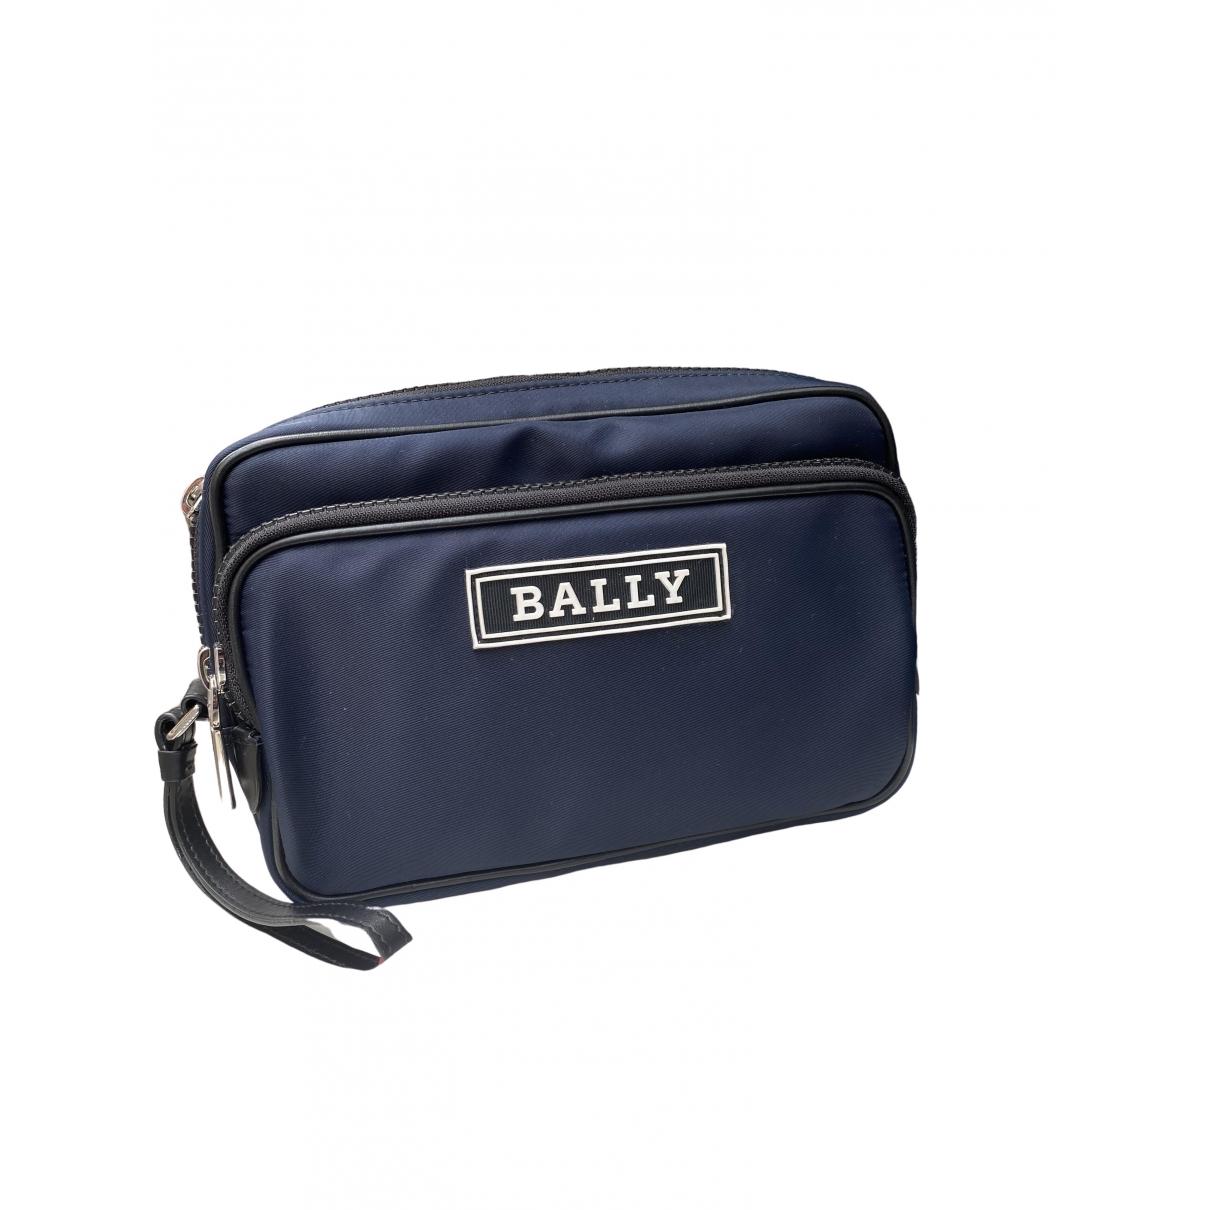 Bally \N Blue Small bag, wallet & cases for Men \N